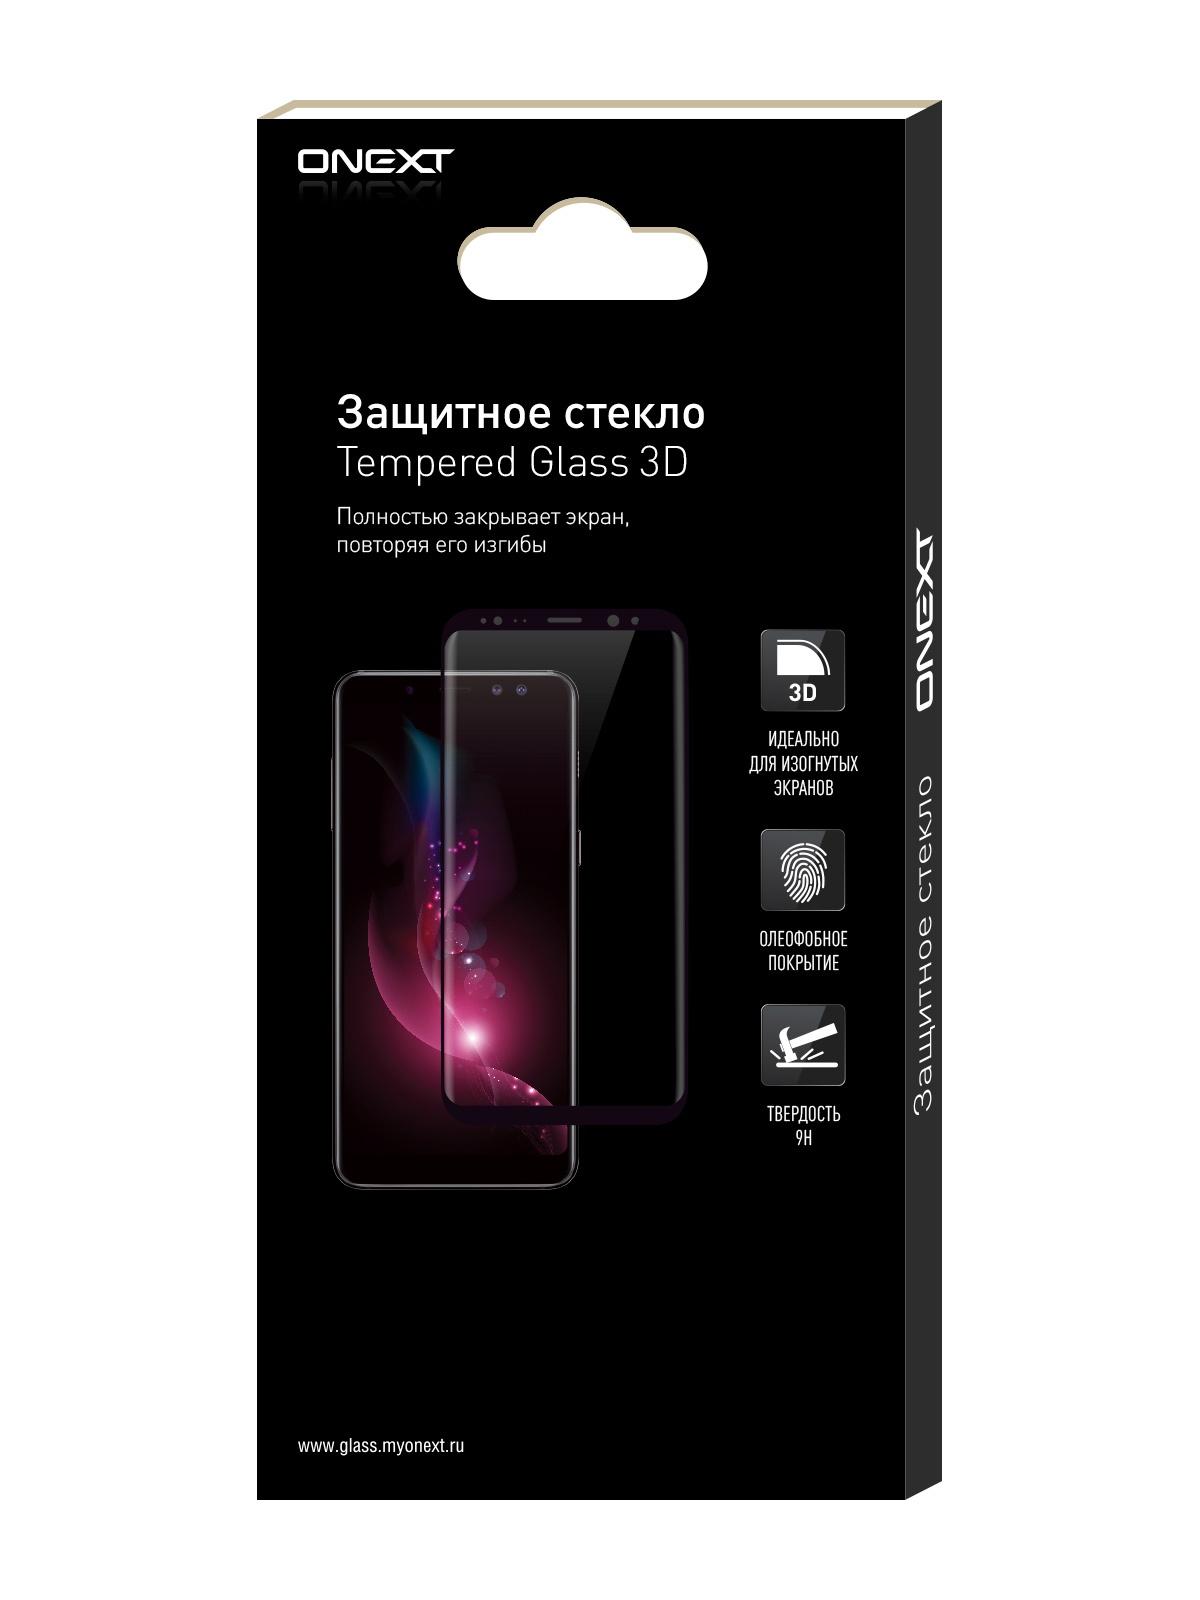 Защитное стекло ONEXT Nokia 7 Plus 3D